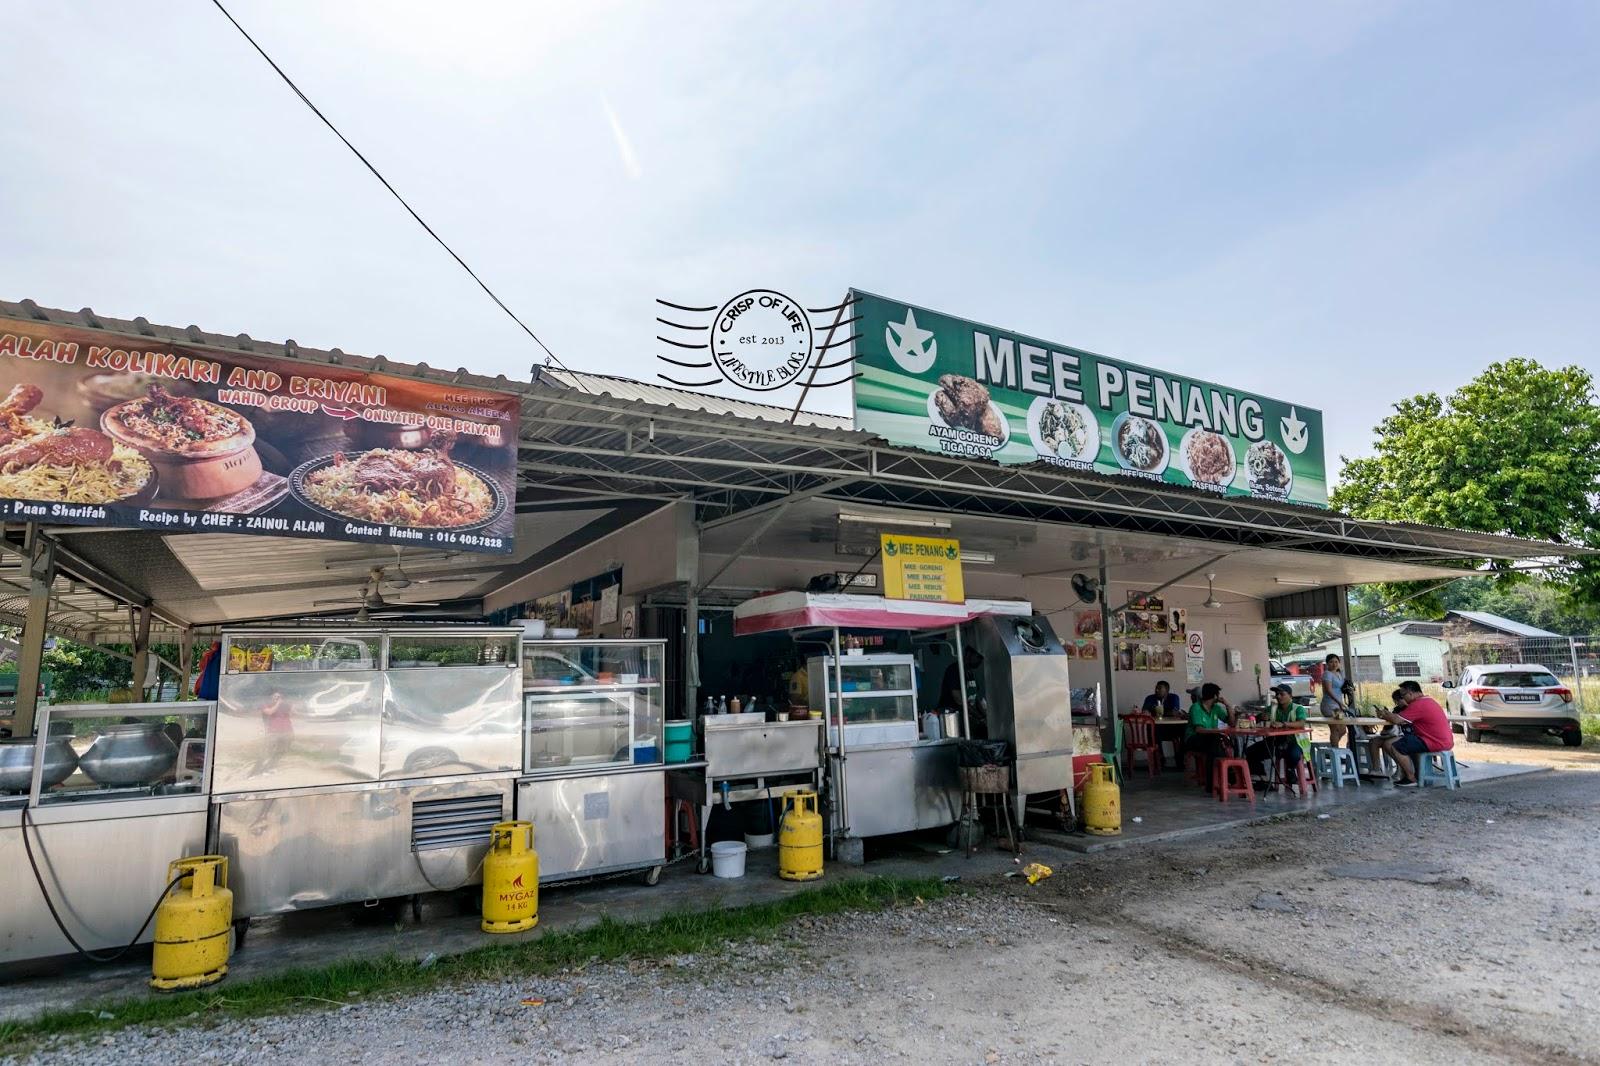 Mee Penang Bukit Tambun at Simpang Ampat, Penang